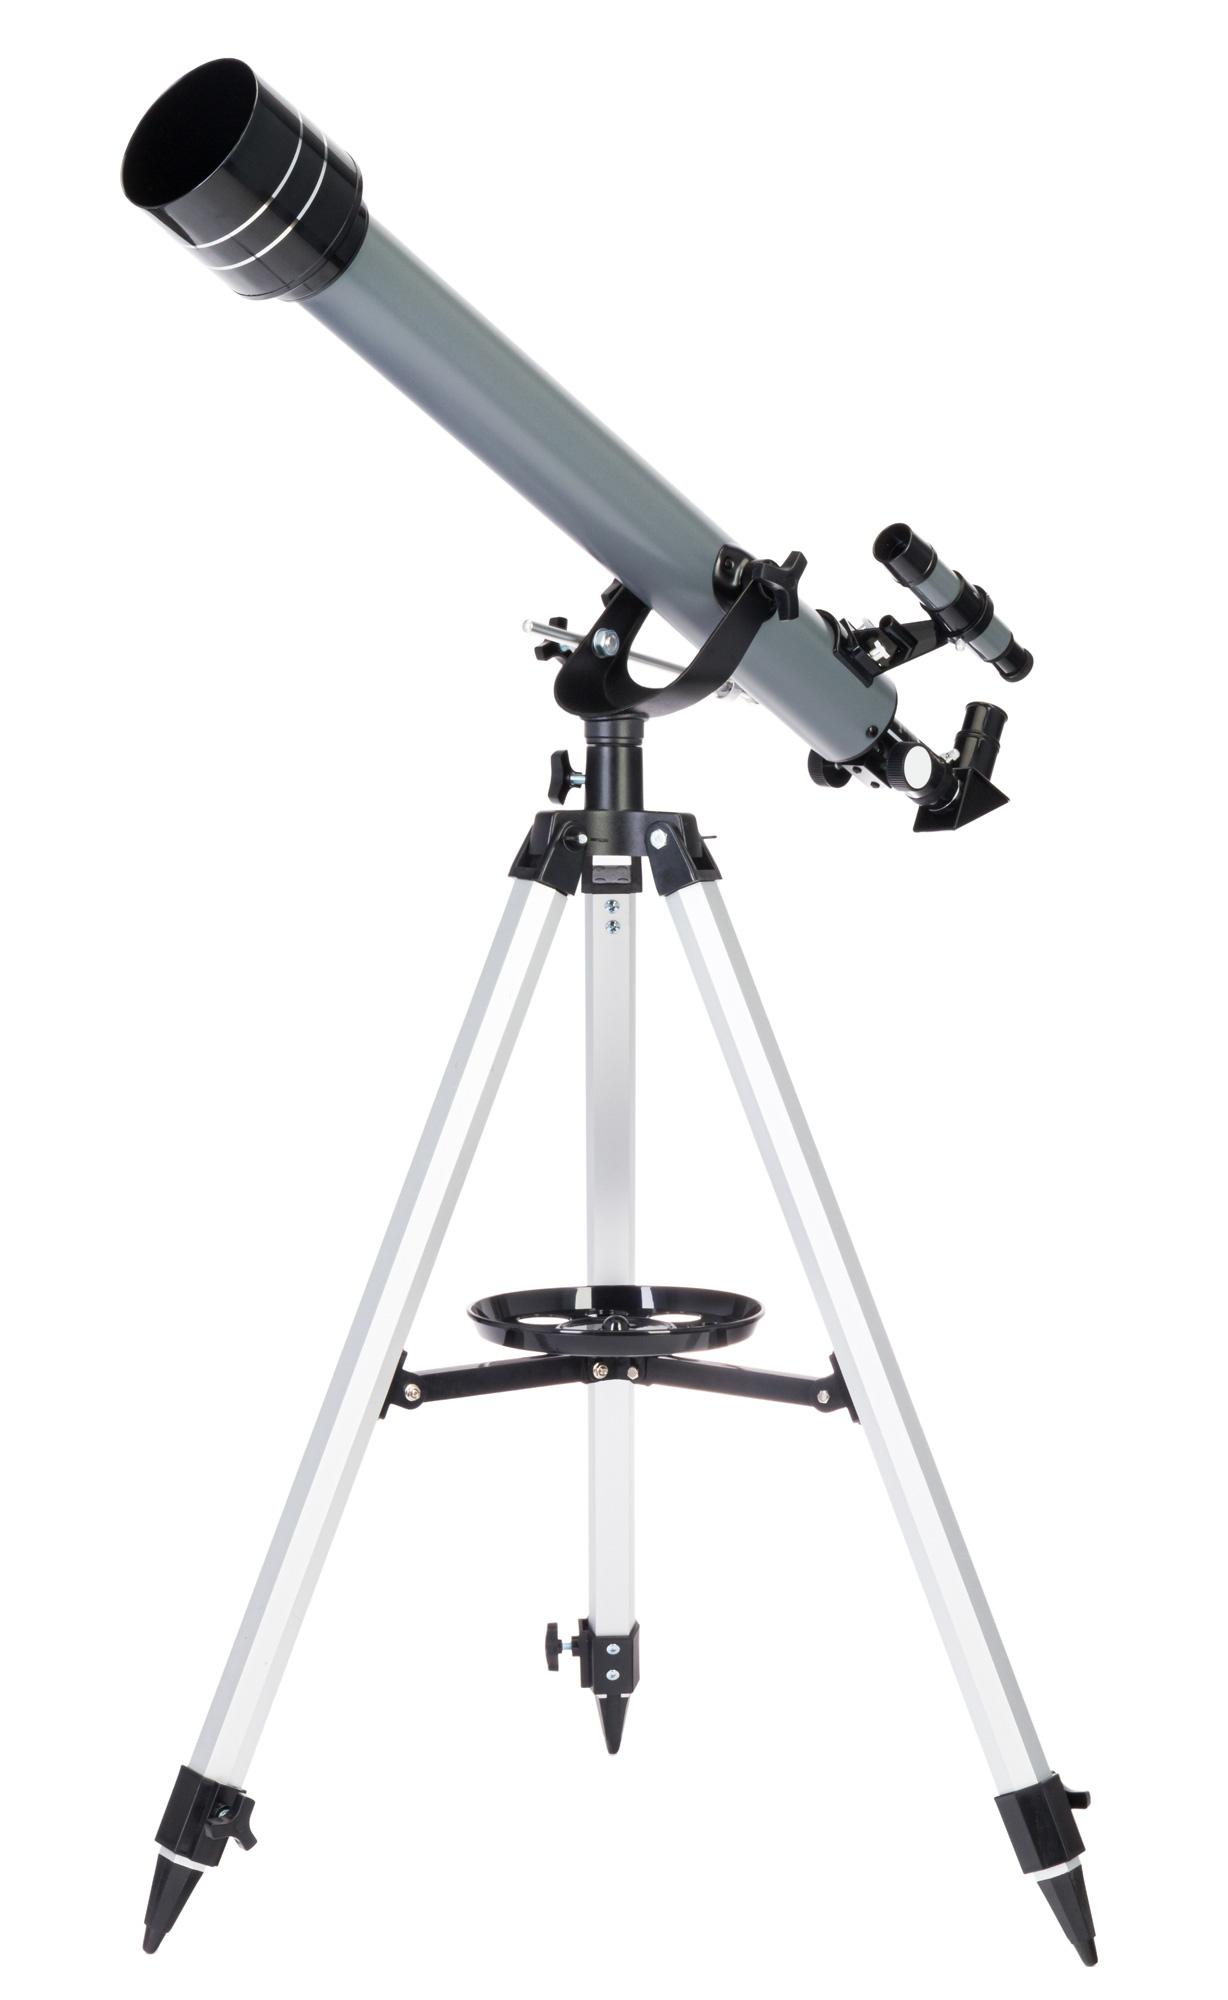 Картинка для Телескоп Levenhuk (Левенгук) Blitz 60 BASE